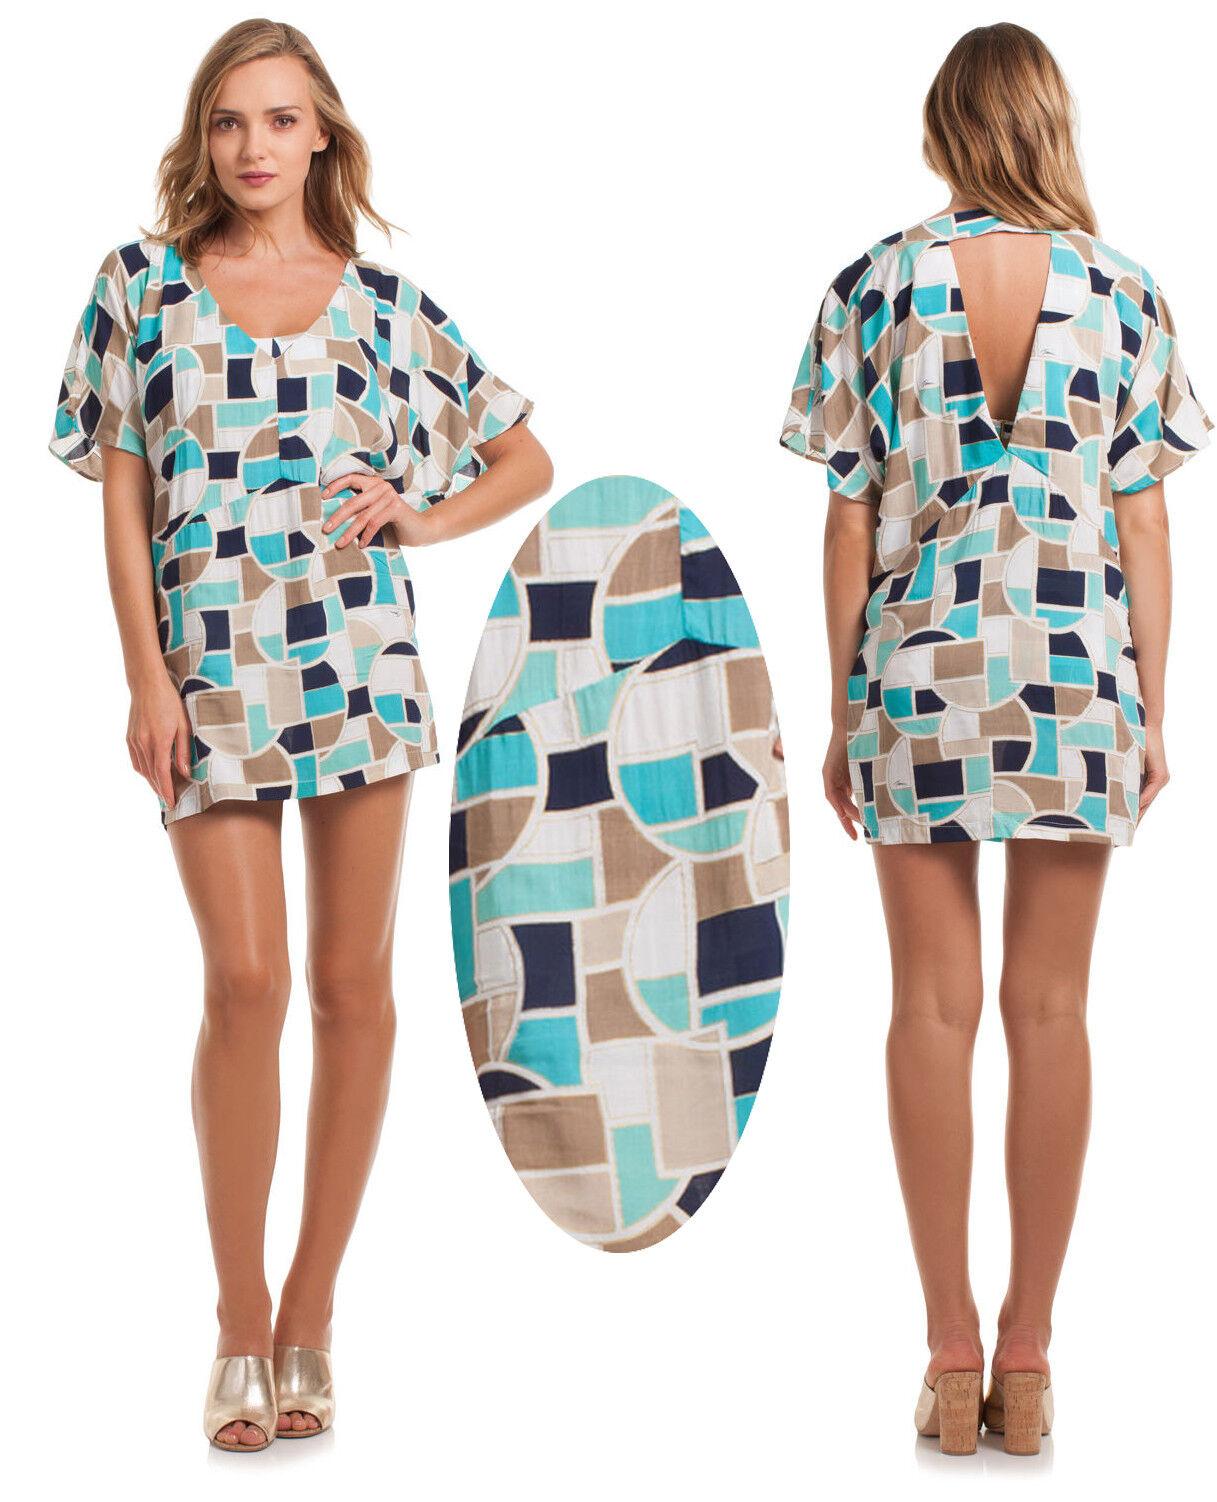 Trina Turk Disco Deco Geometrisk kimono Tunic baddräkt Cover Up Dress L